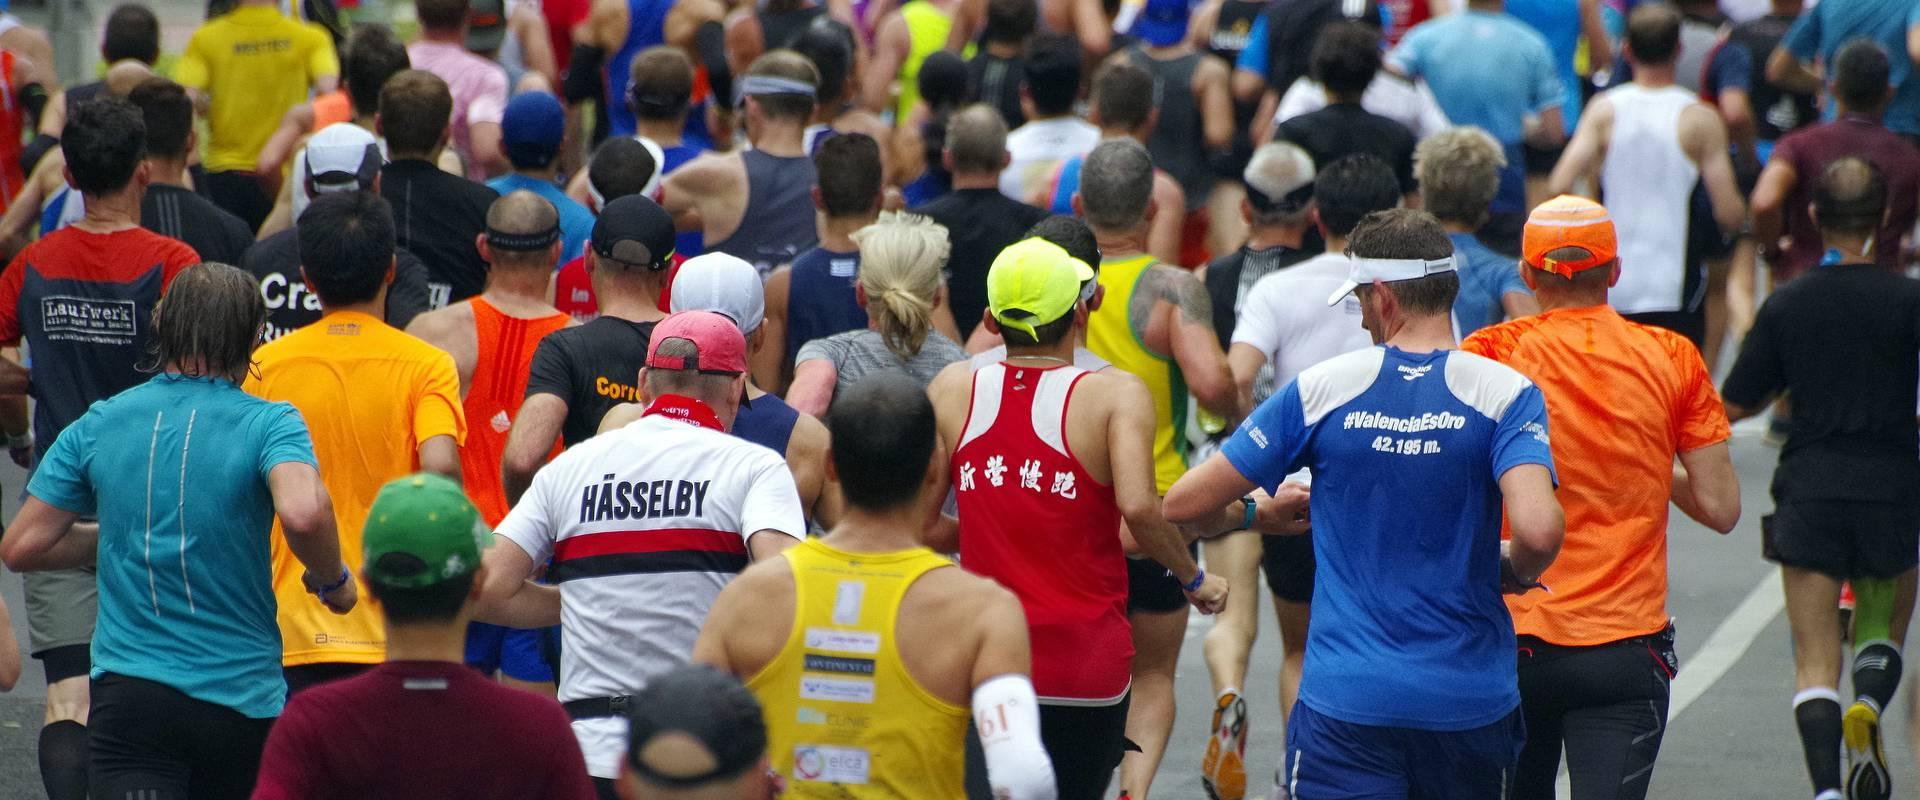 marathon-6580967_1920